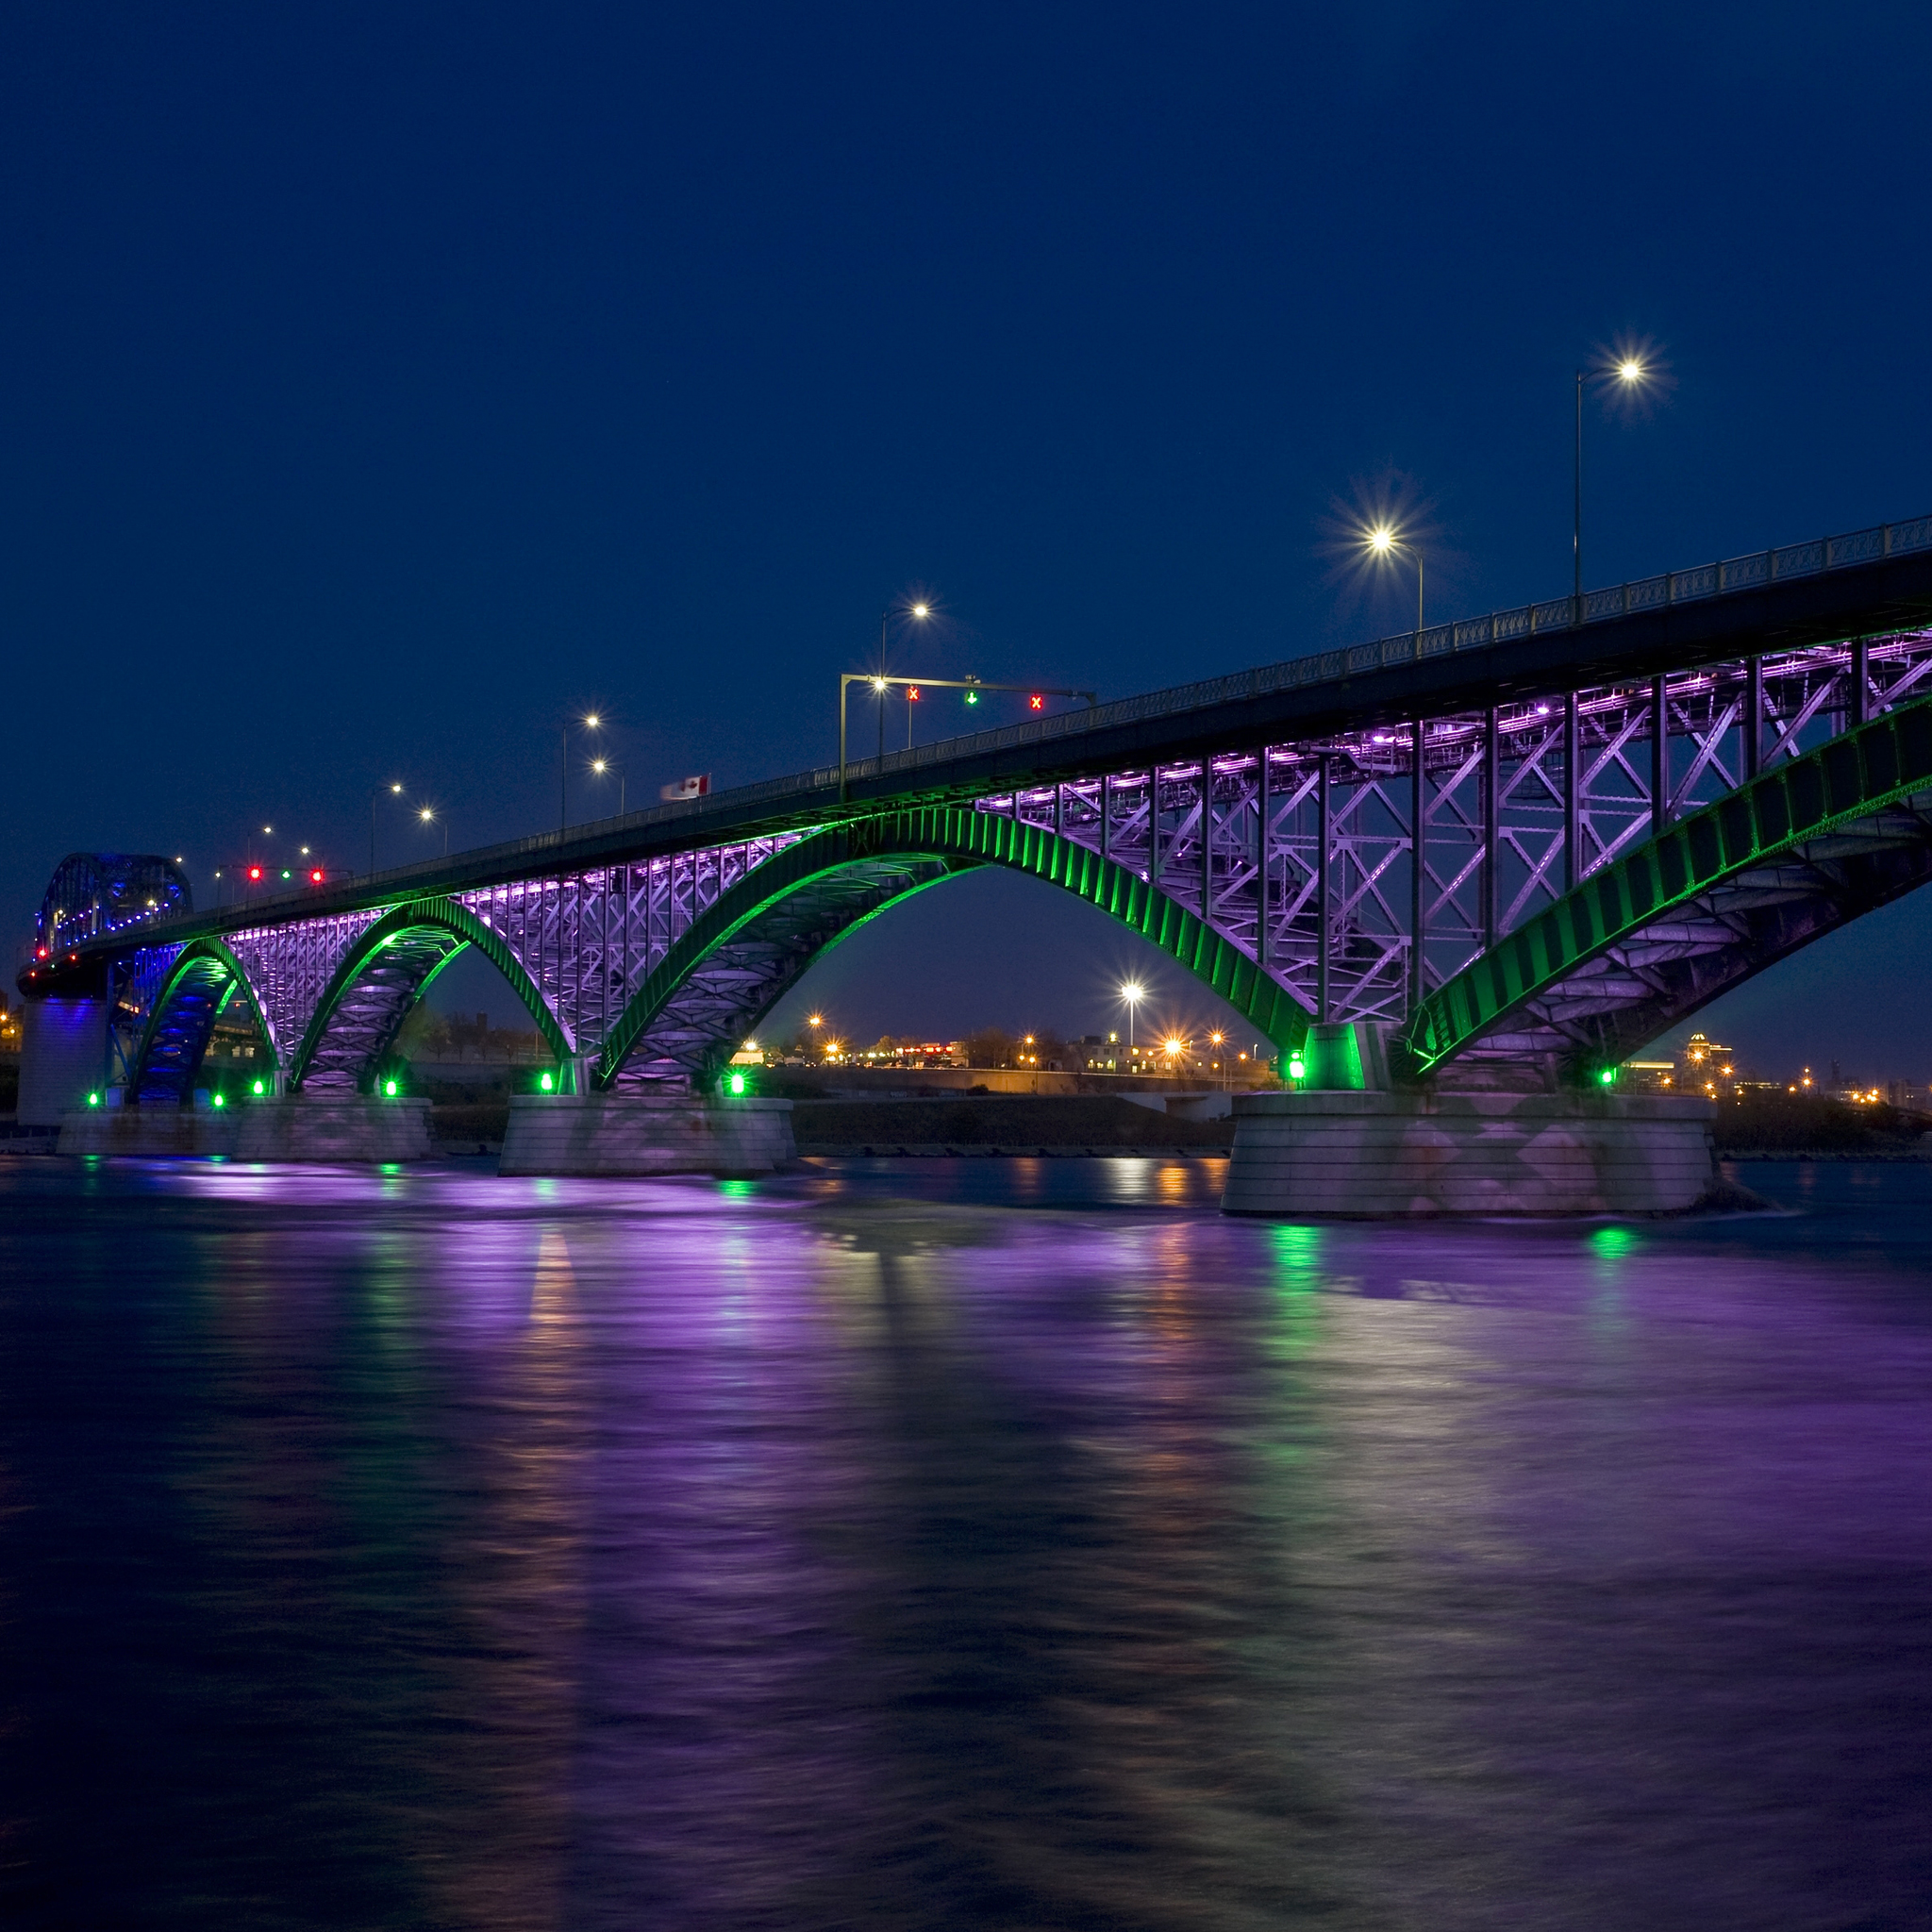 Peace Bridge by Night 3Wallpapers iPad Retina Peace Bridge by Night   iPad Retina